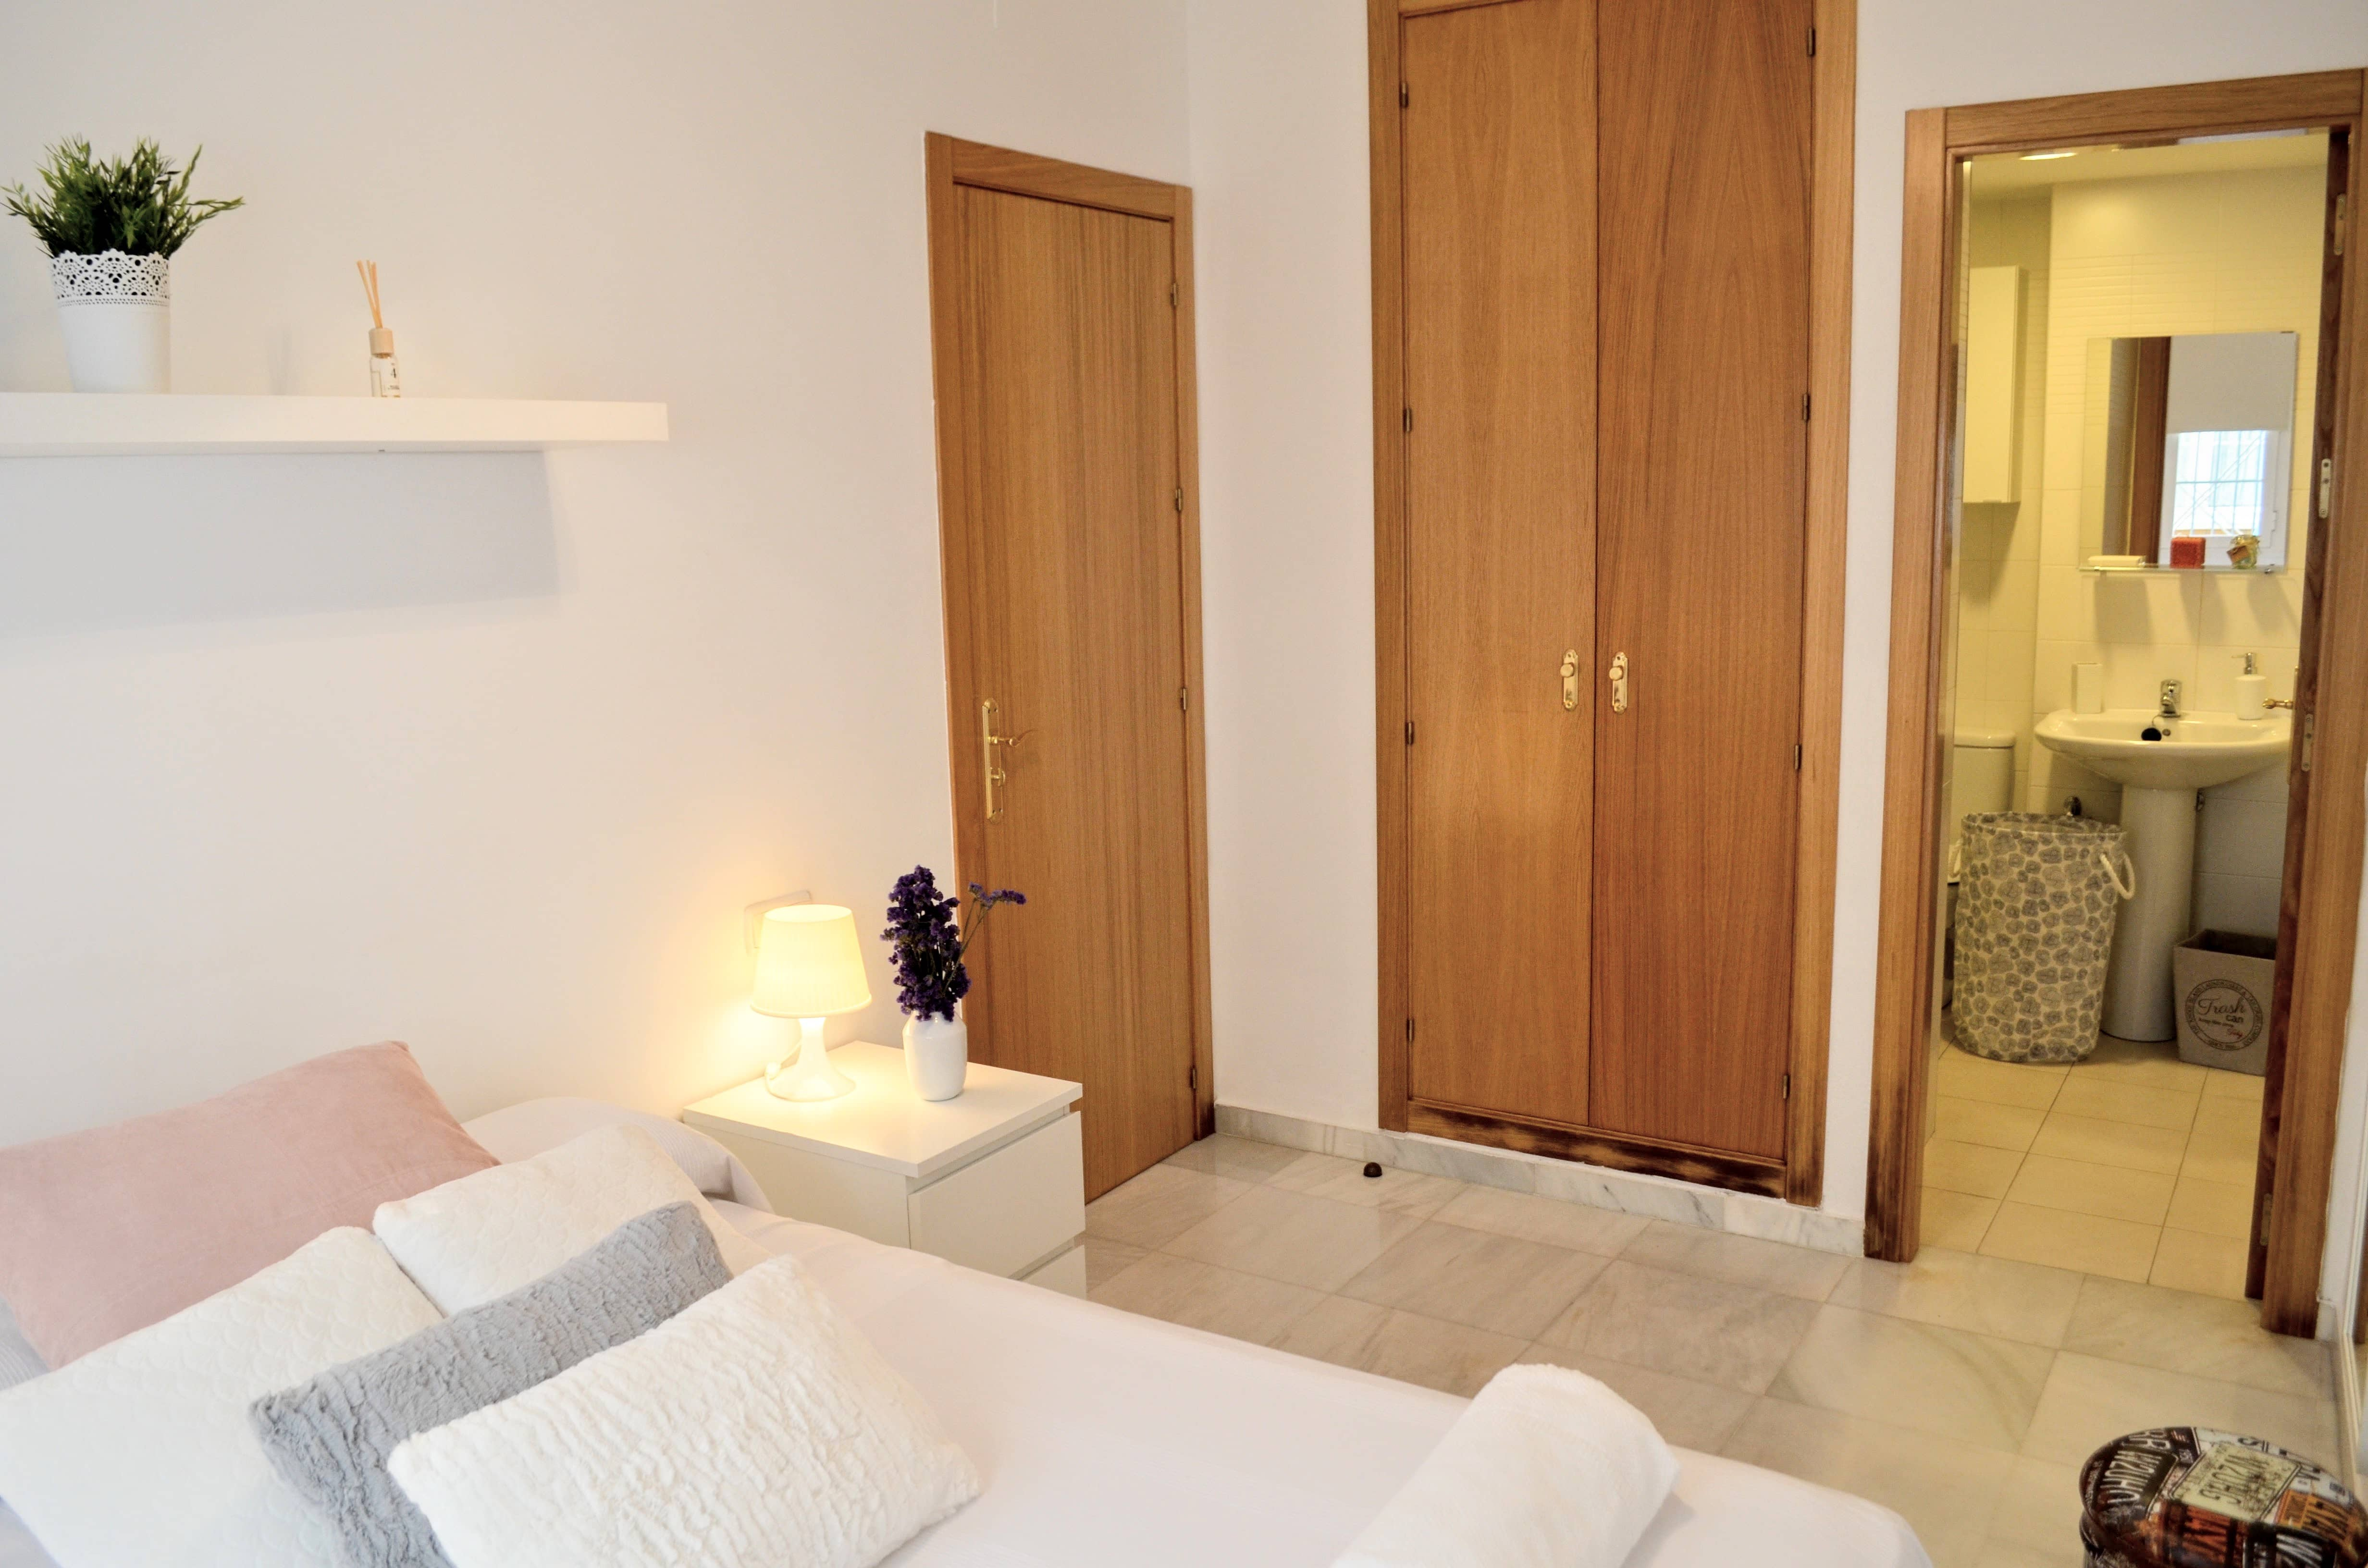 Balneario con dormitorio y terraza privada  0432